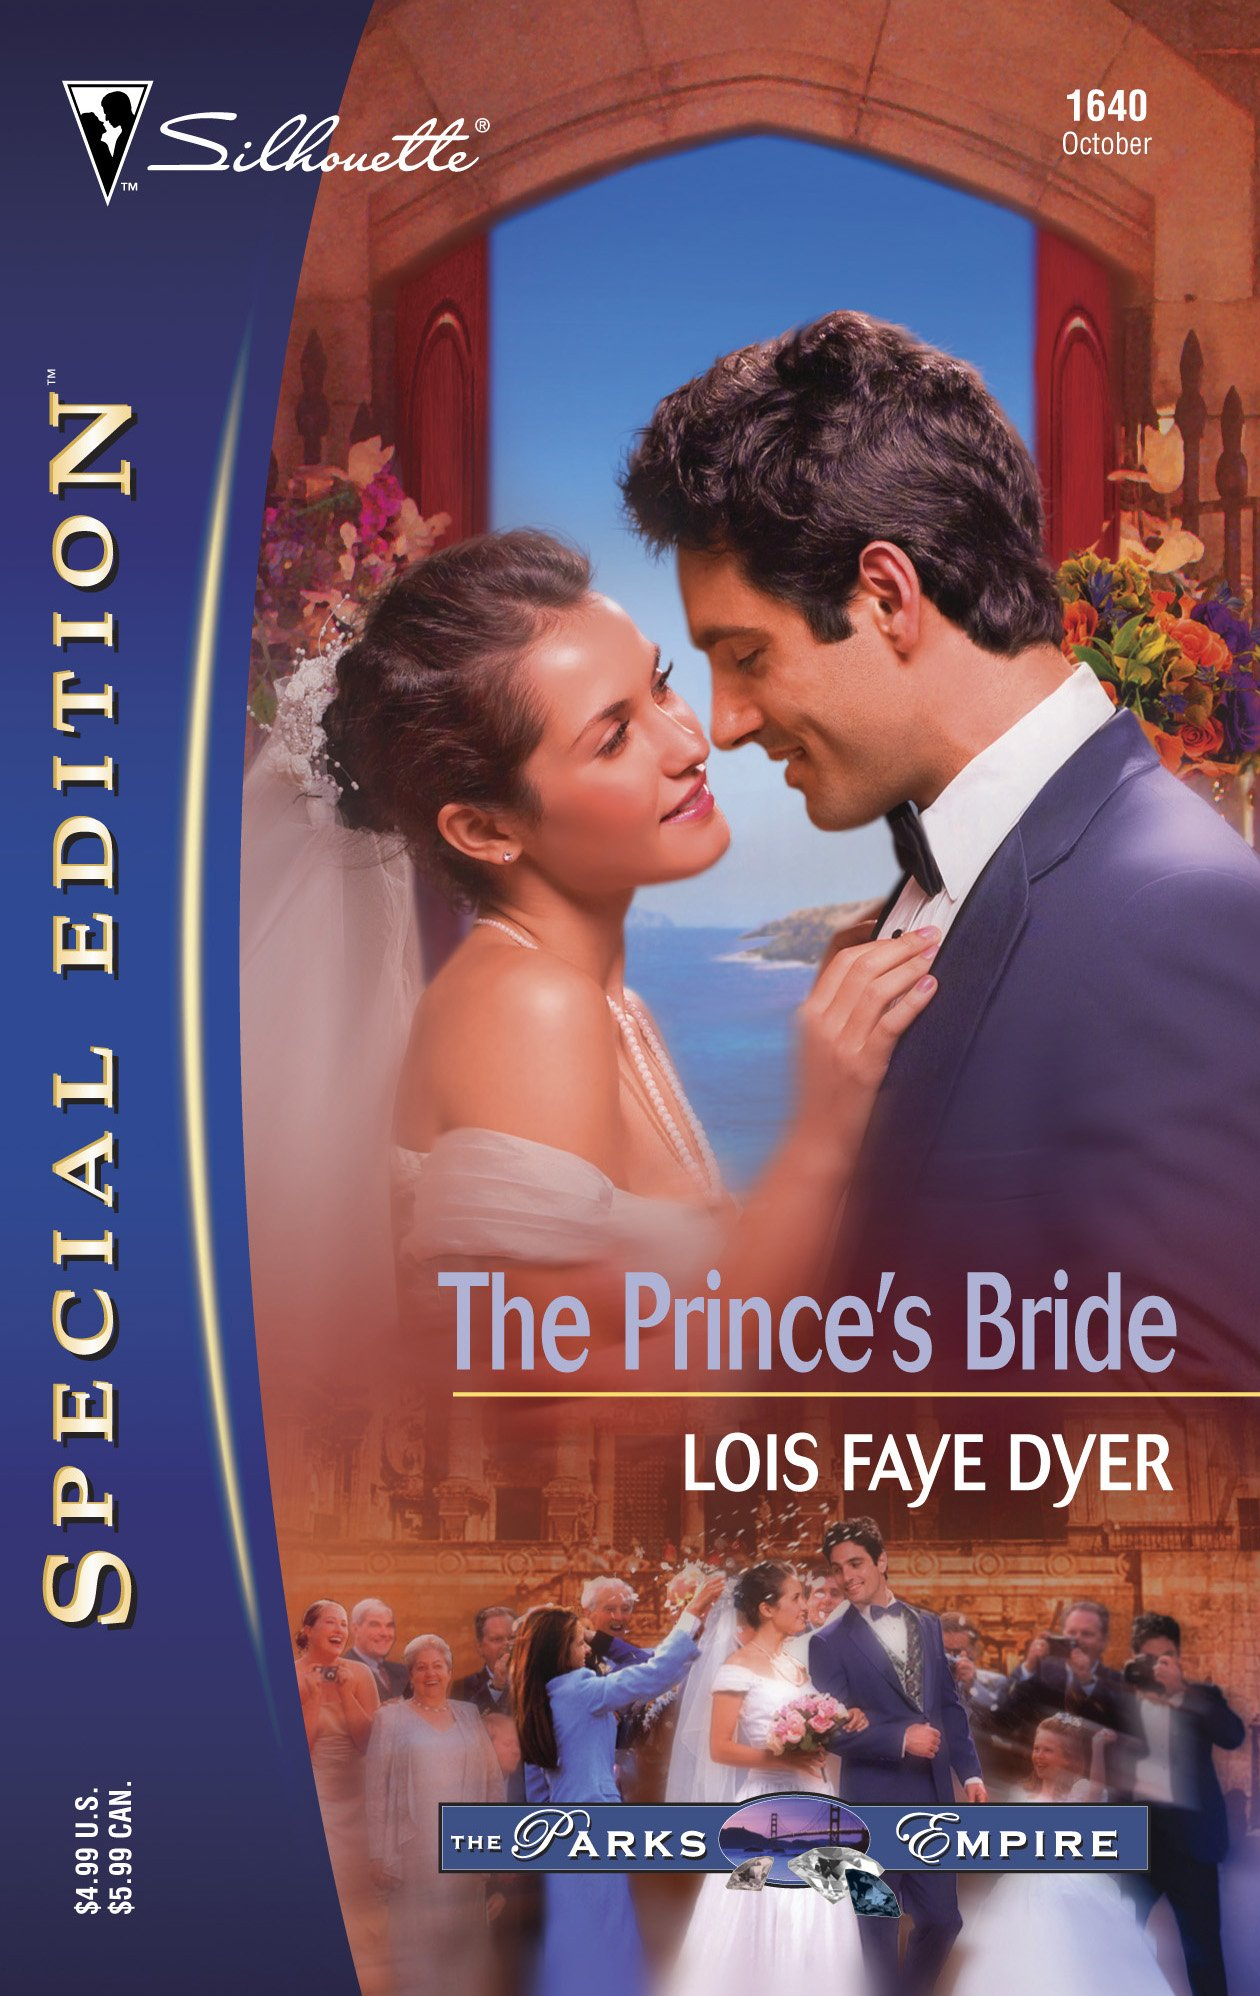 Read Online The Prince's Bride (The Parks Empire) (Silhouette Special Edition, No 1640) pdf epub